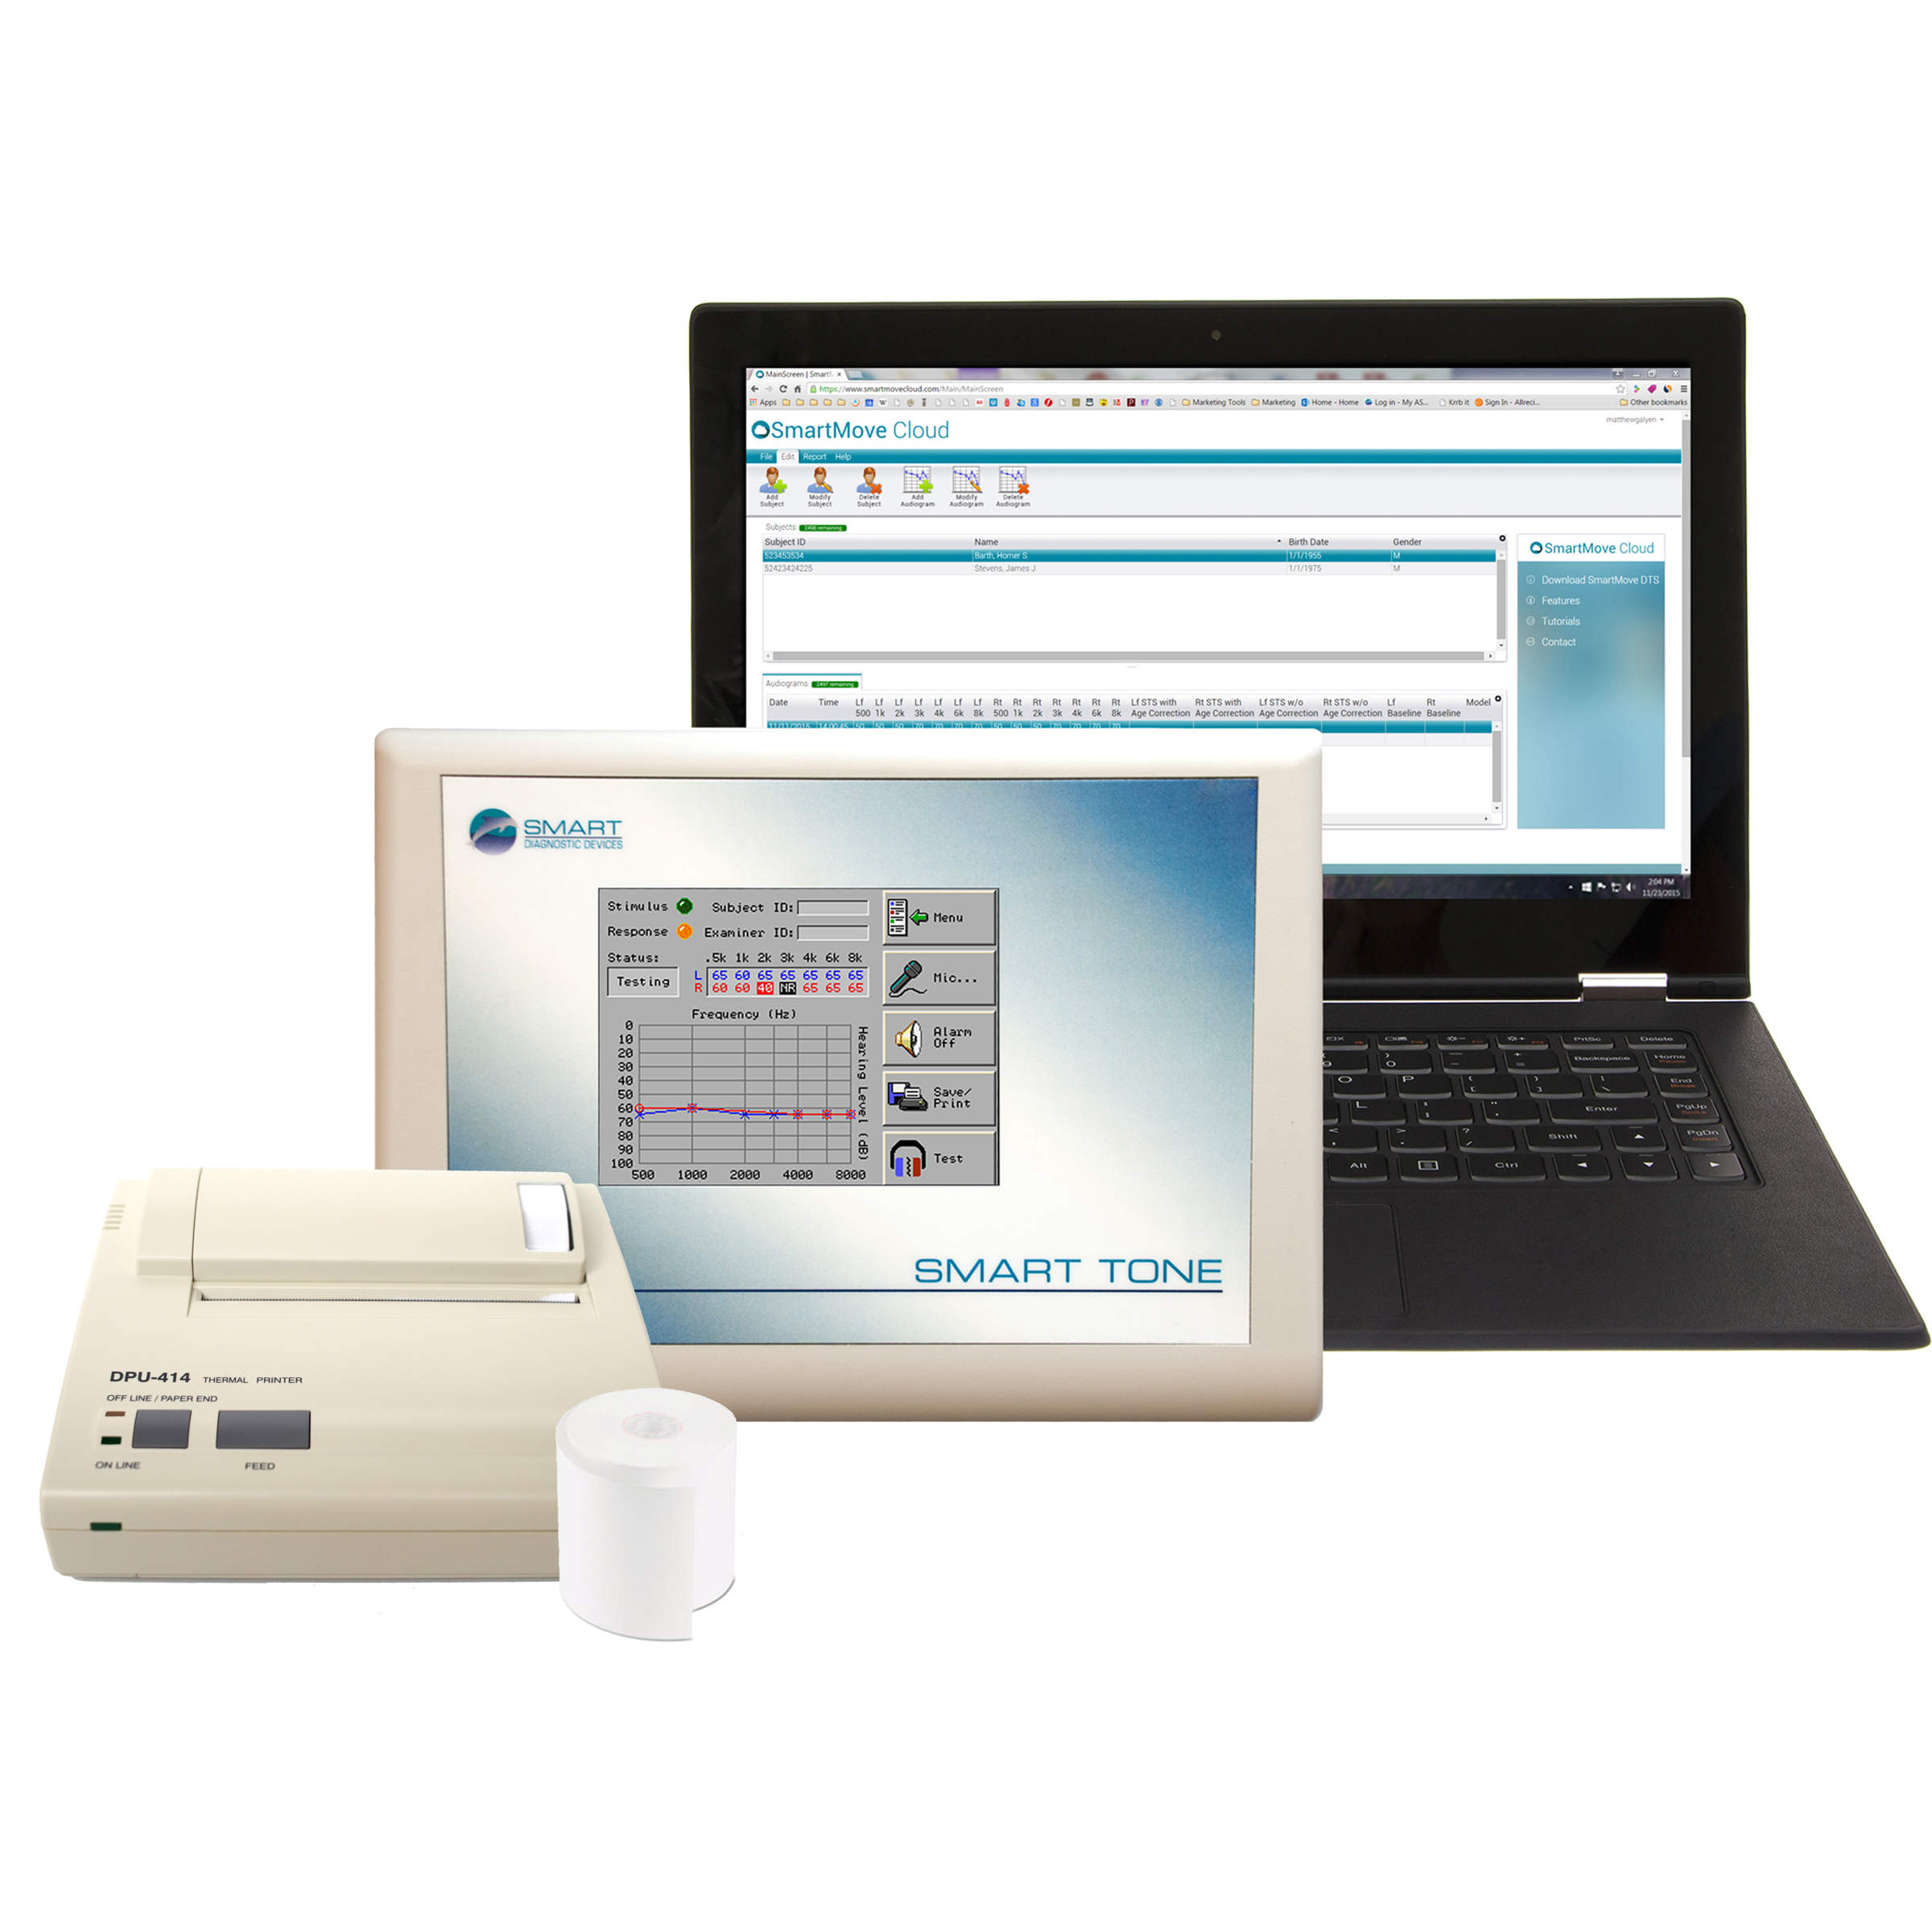 SMART TONE Audiometer with Printer